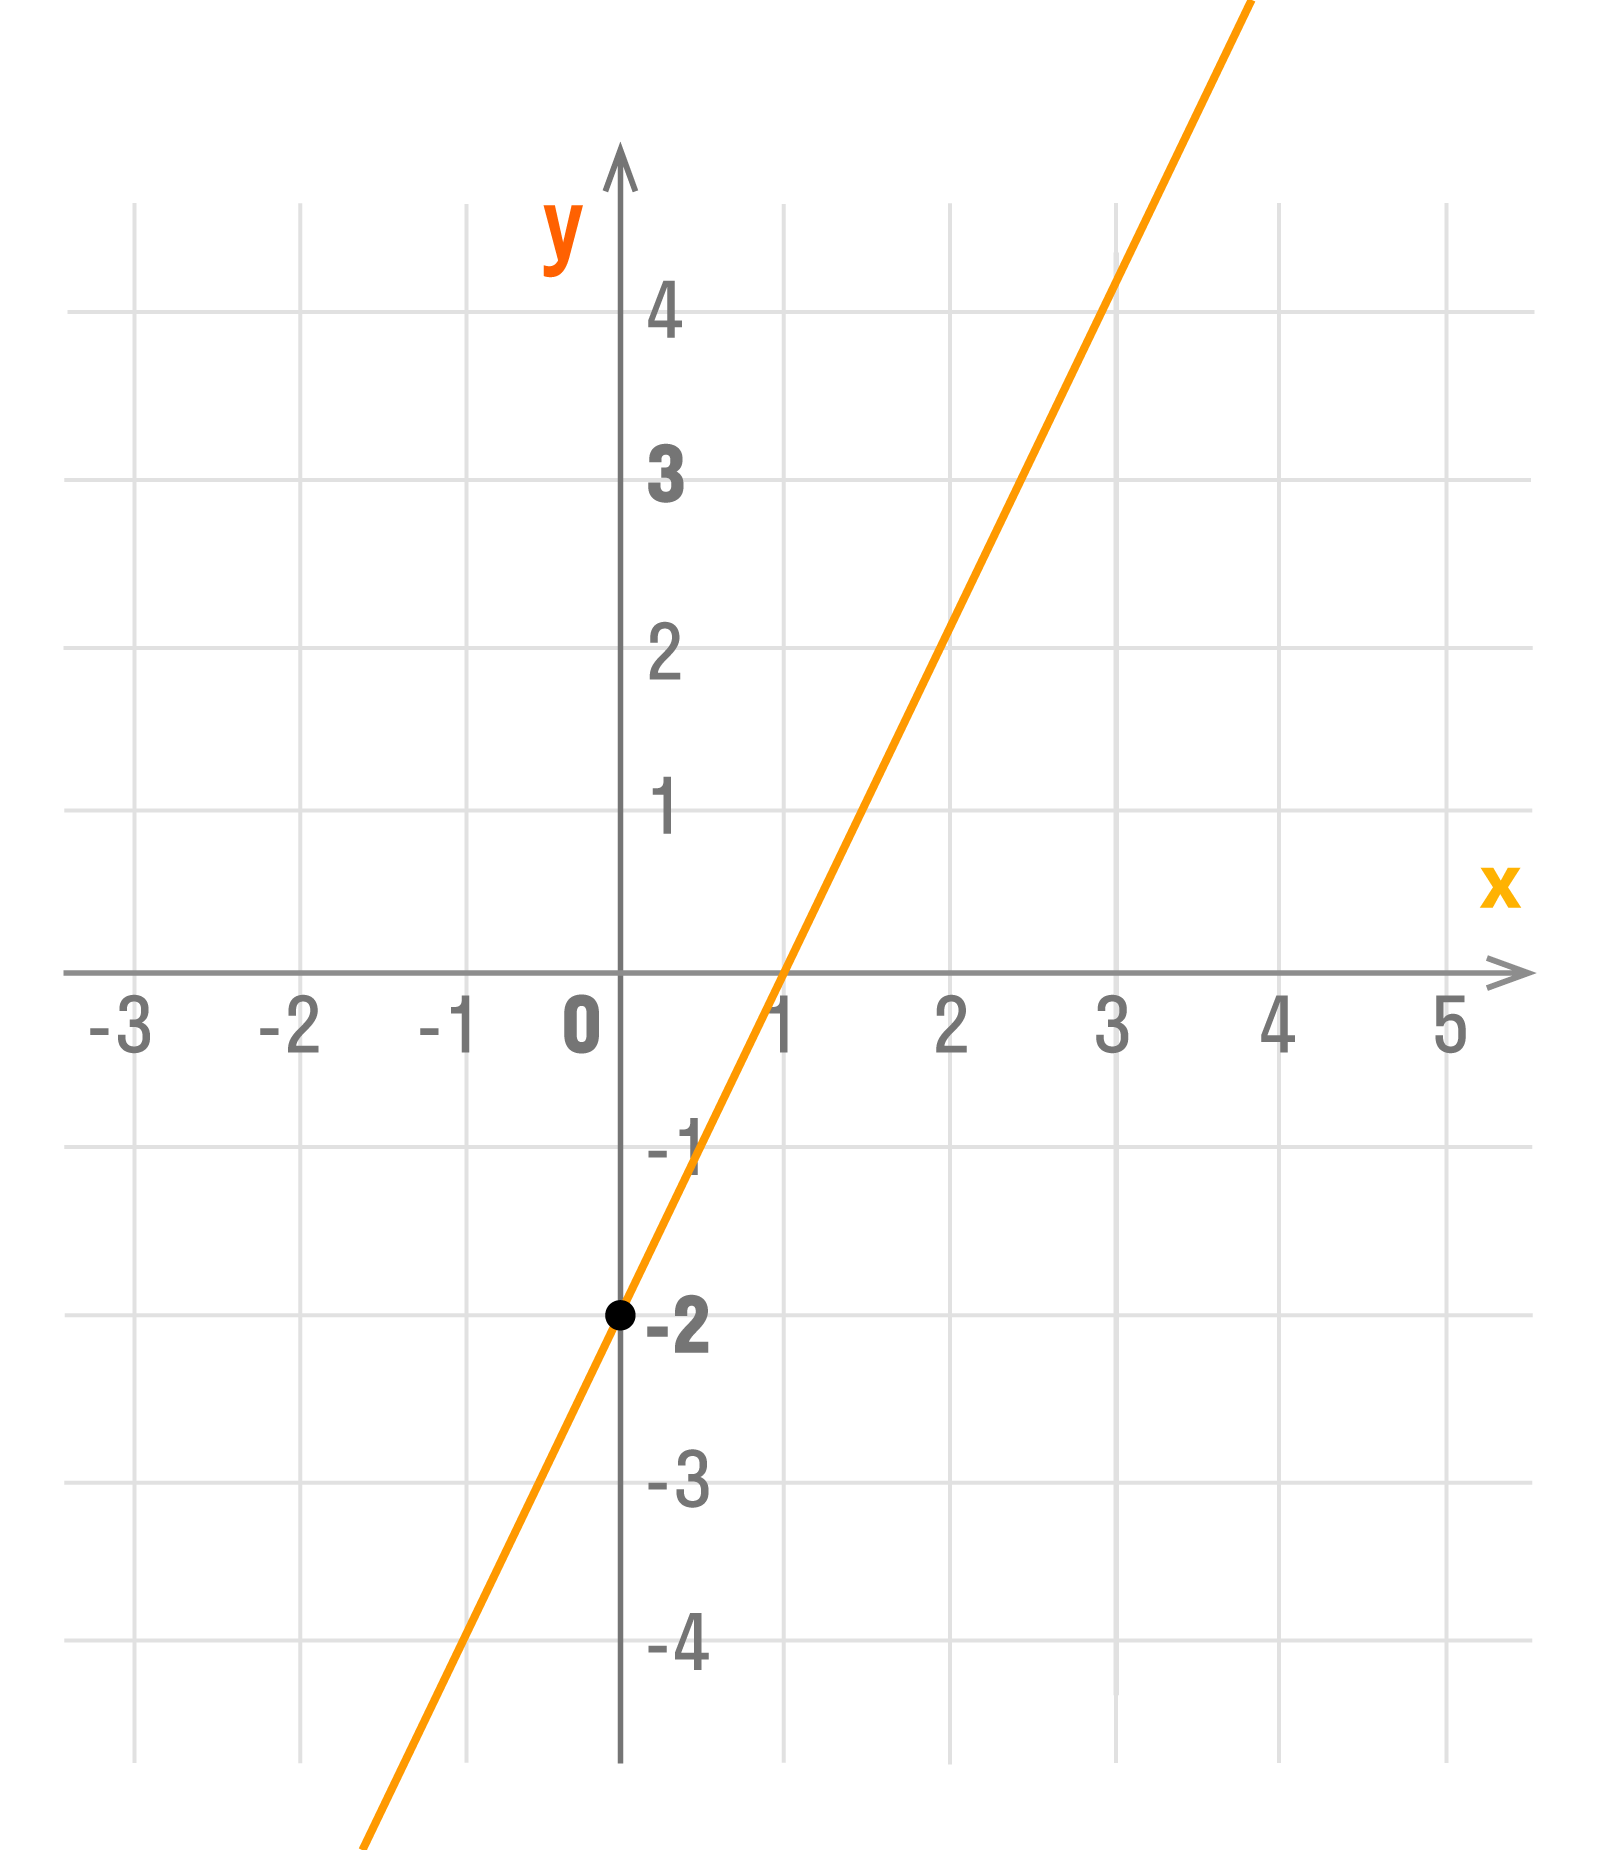 график функции y = kx + b при k > 0 и b < 0